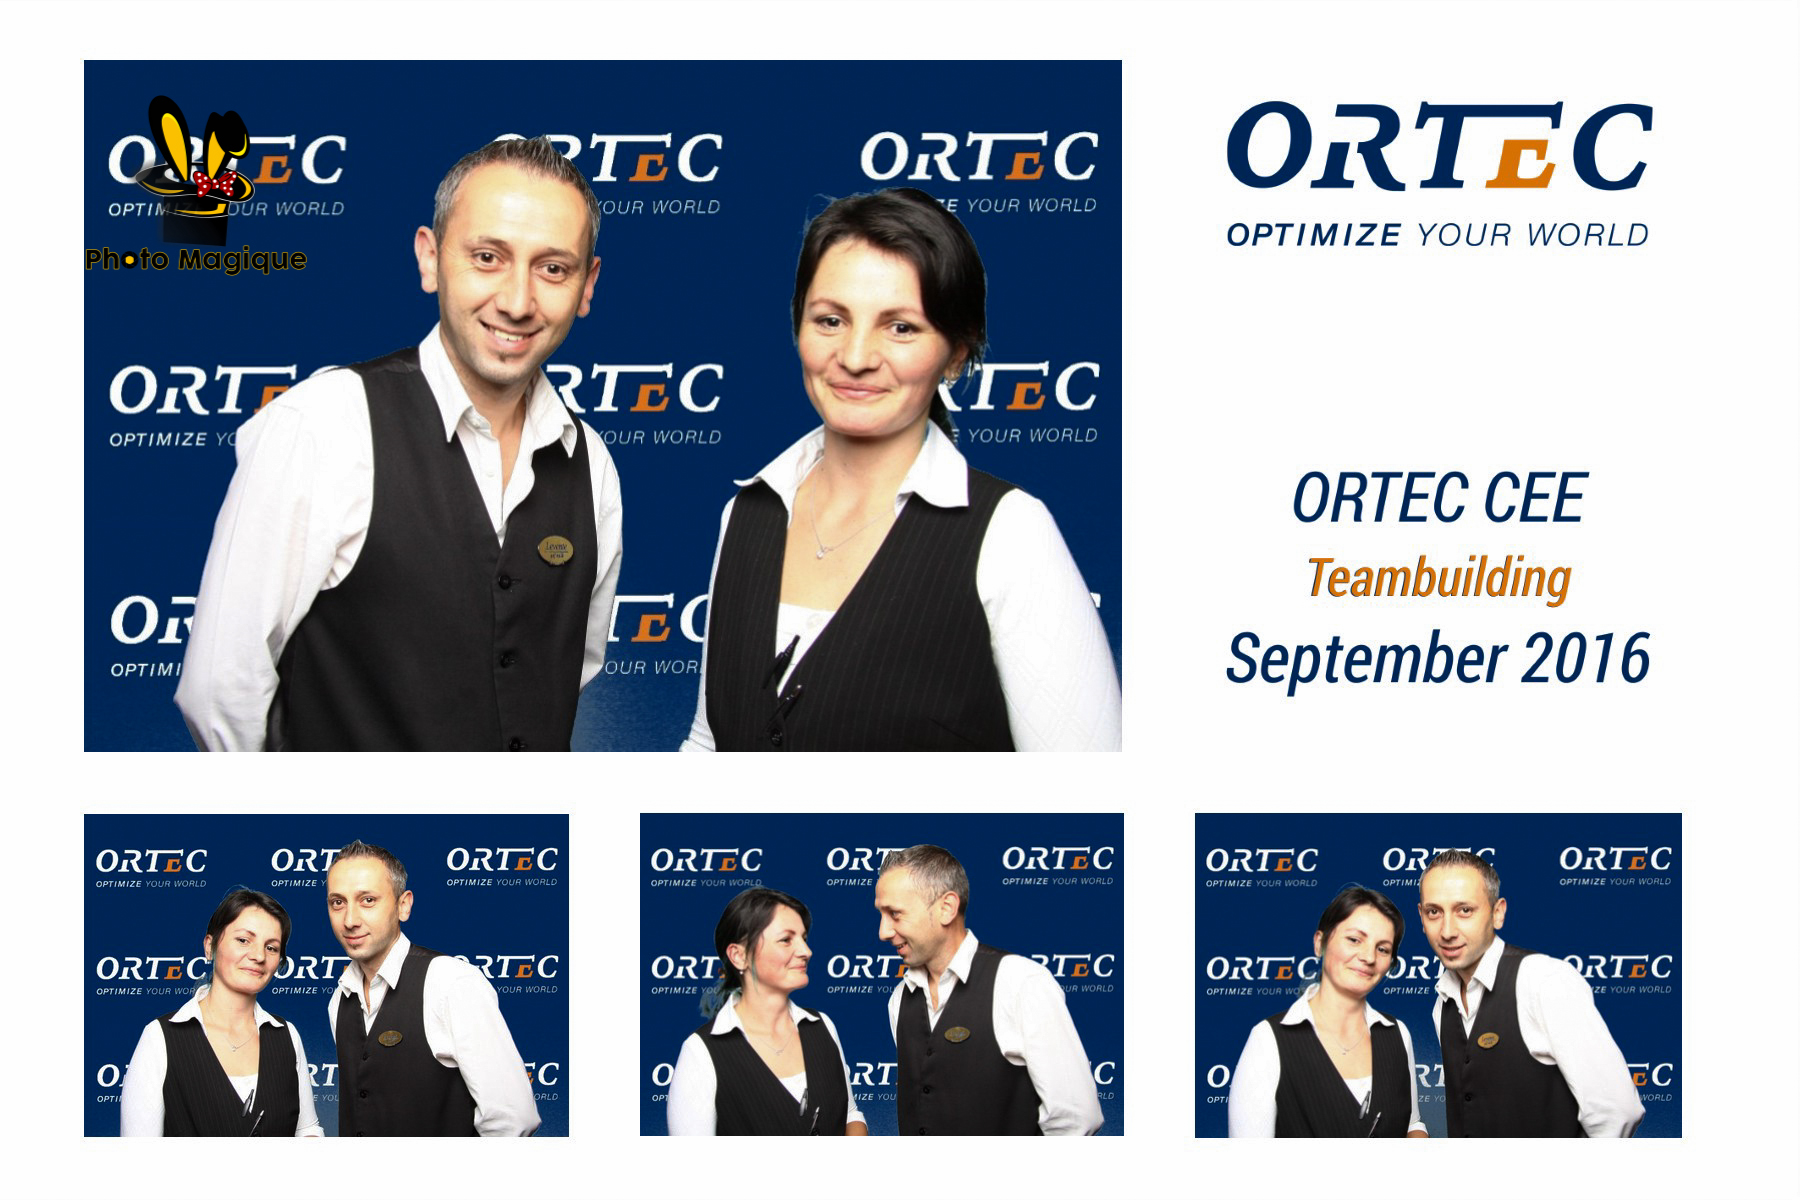 https://www.photomagique.ro/wp-content/uploads/2020/05/TB-ORTEC-2016-002.jpg